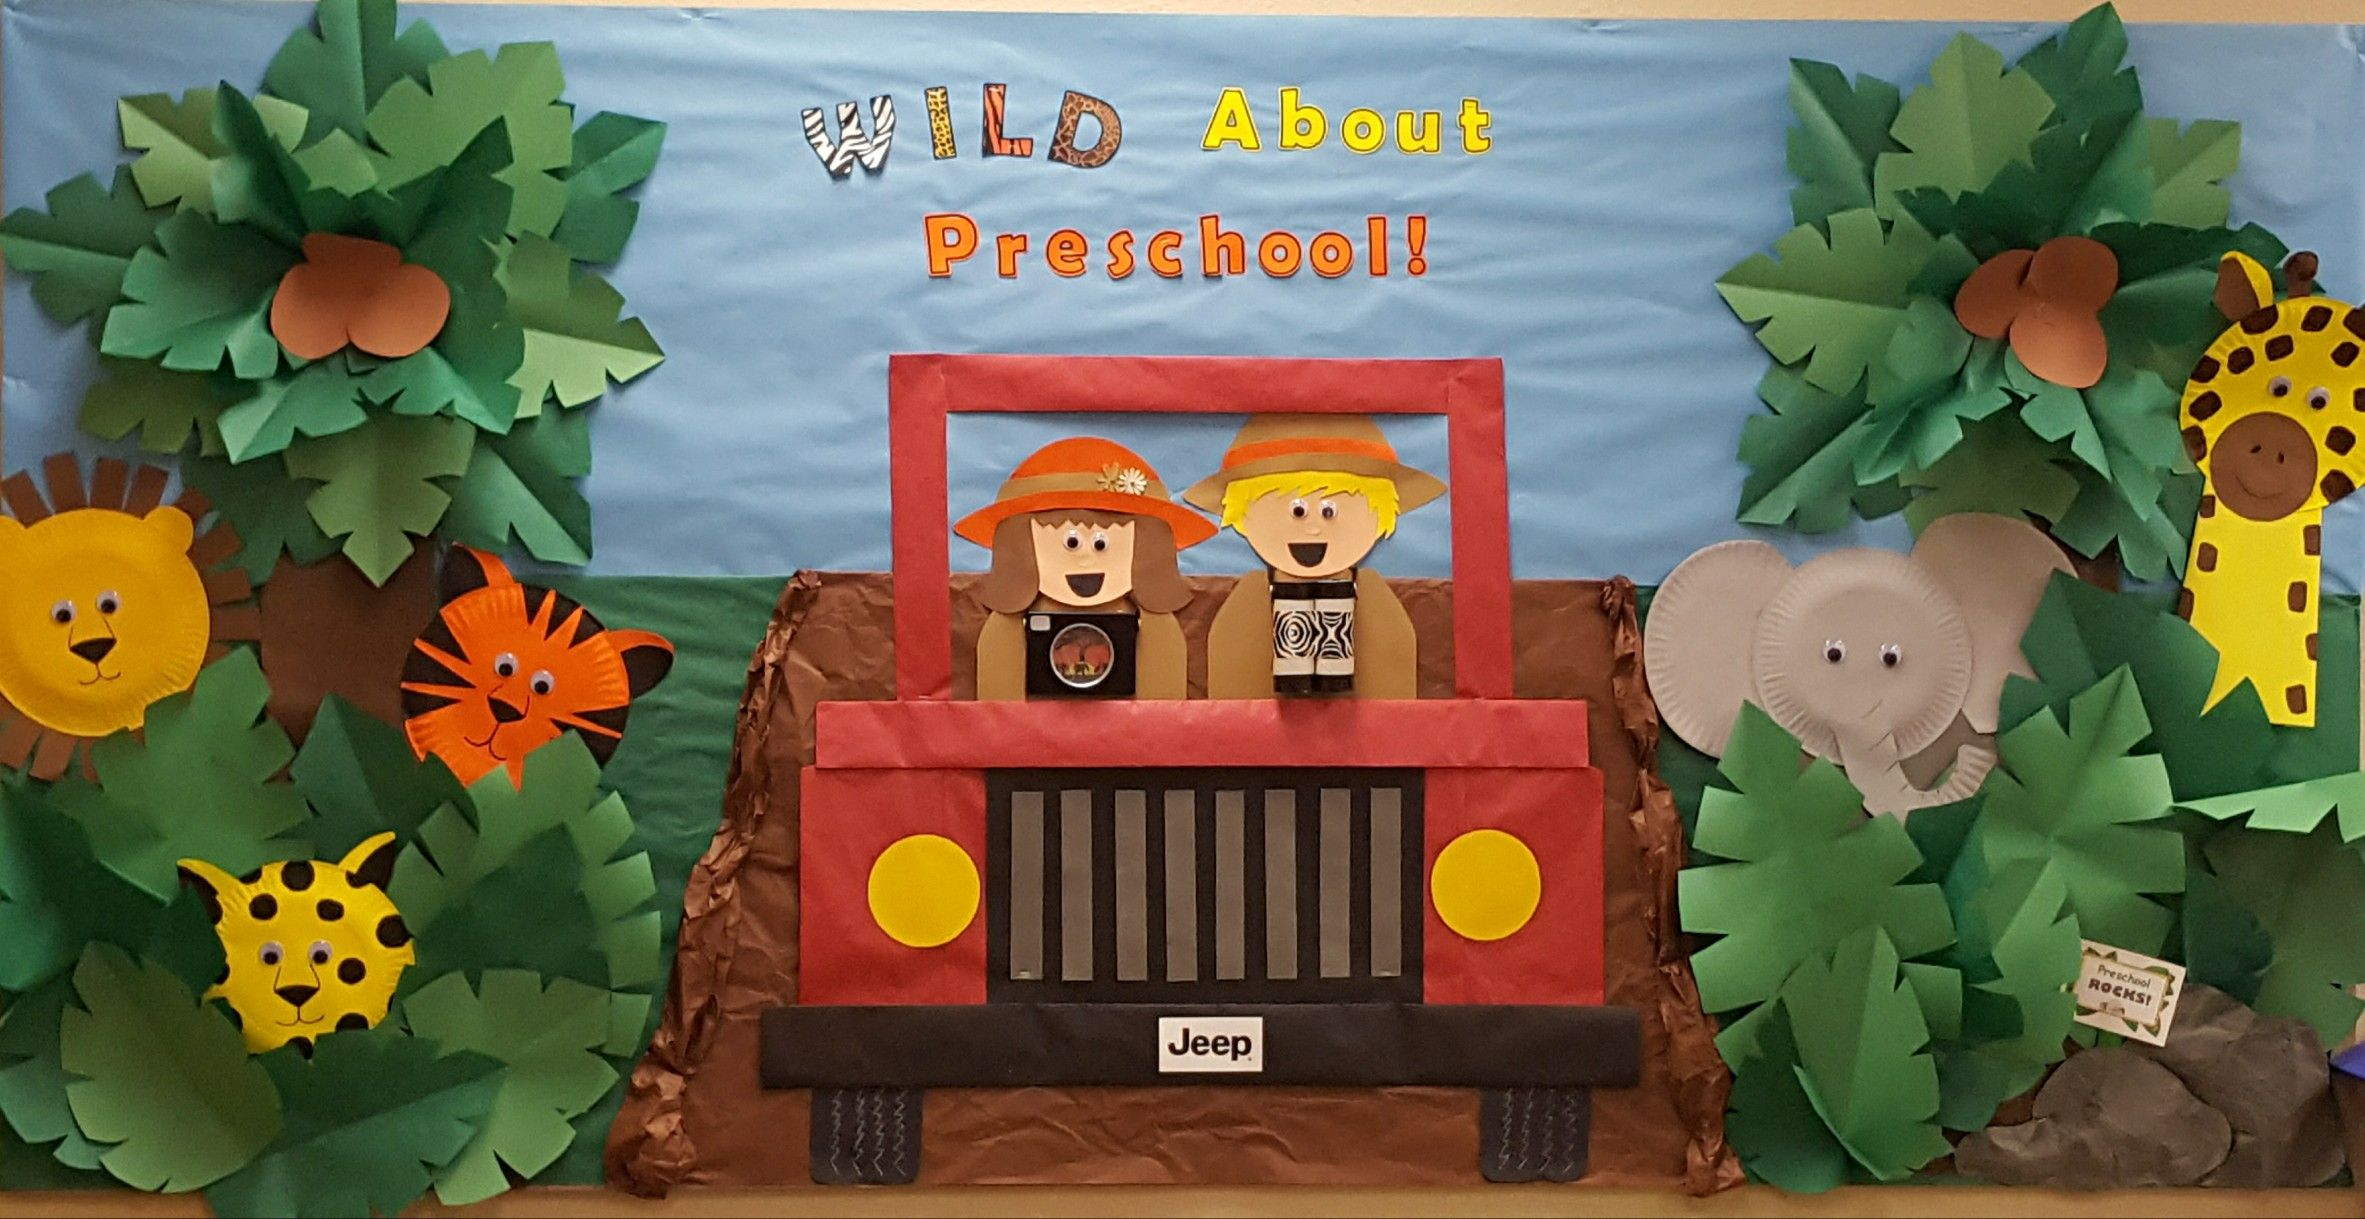 Wild About Preschool Jungle Themed Bulletin Board All